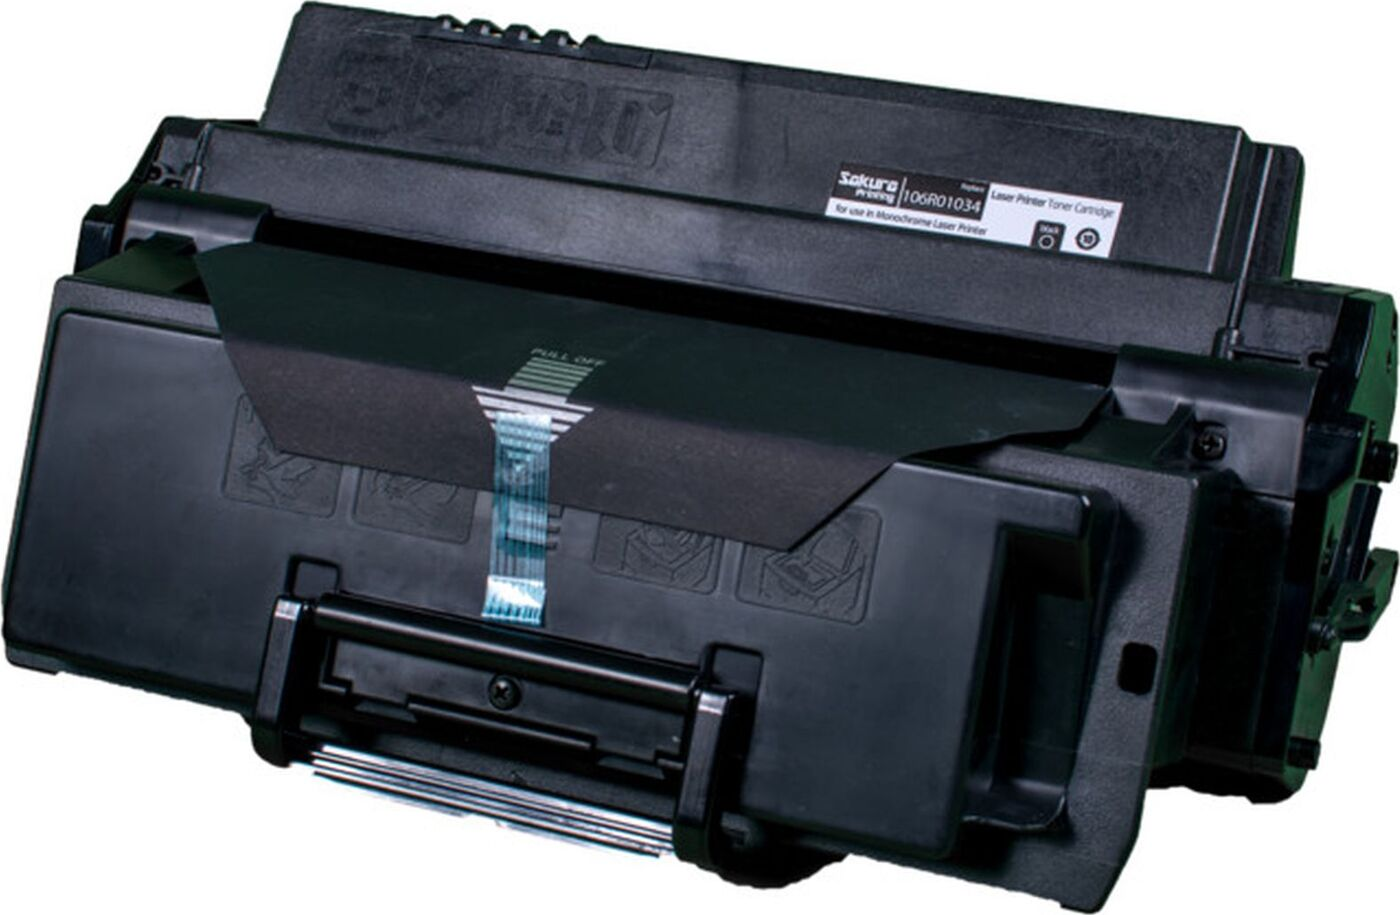 Картридж SAKURA 106R01034 для Xerox P3420/3425, черный 10000 к.